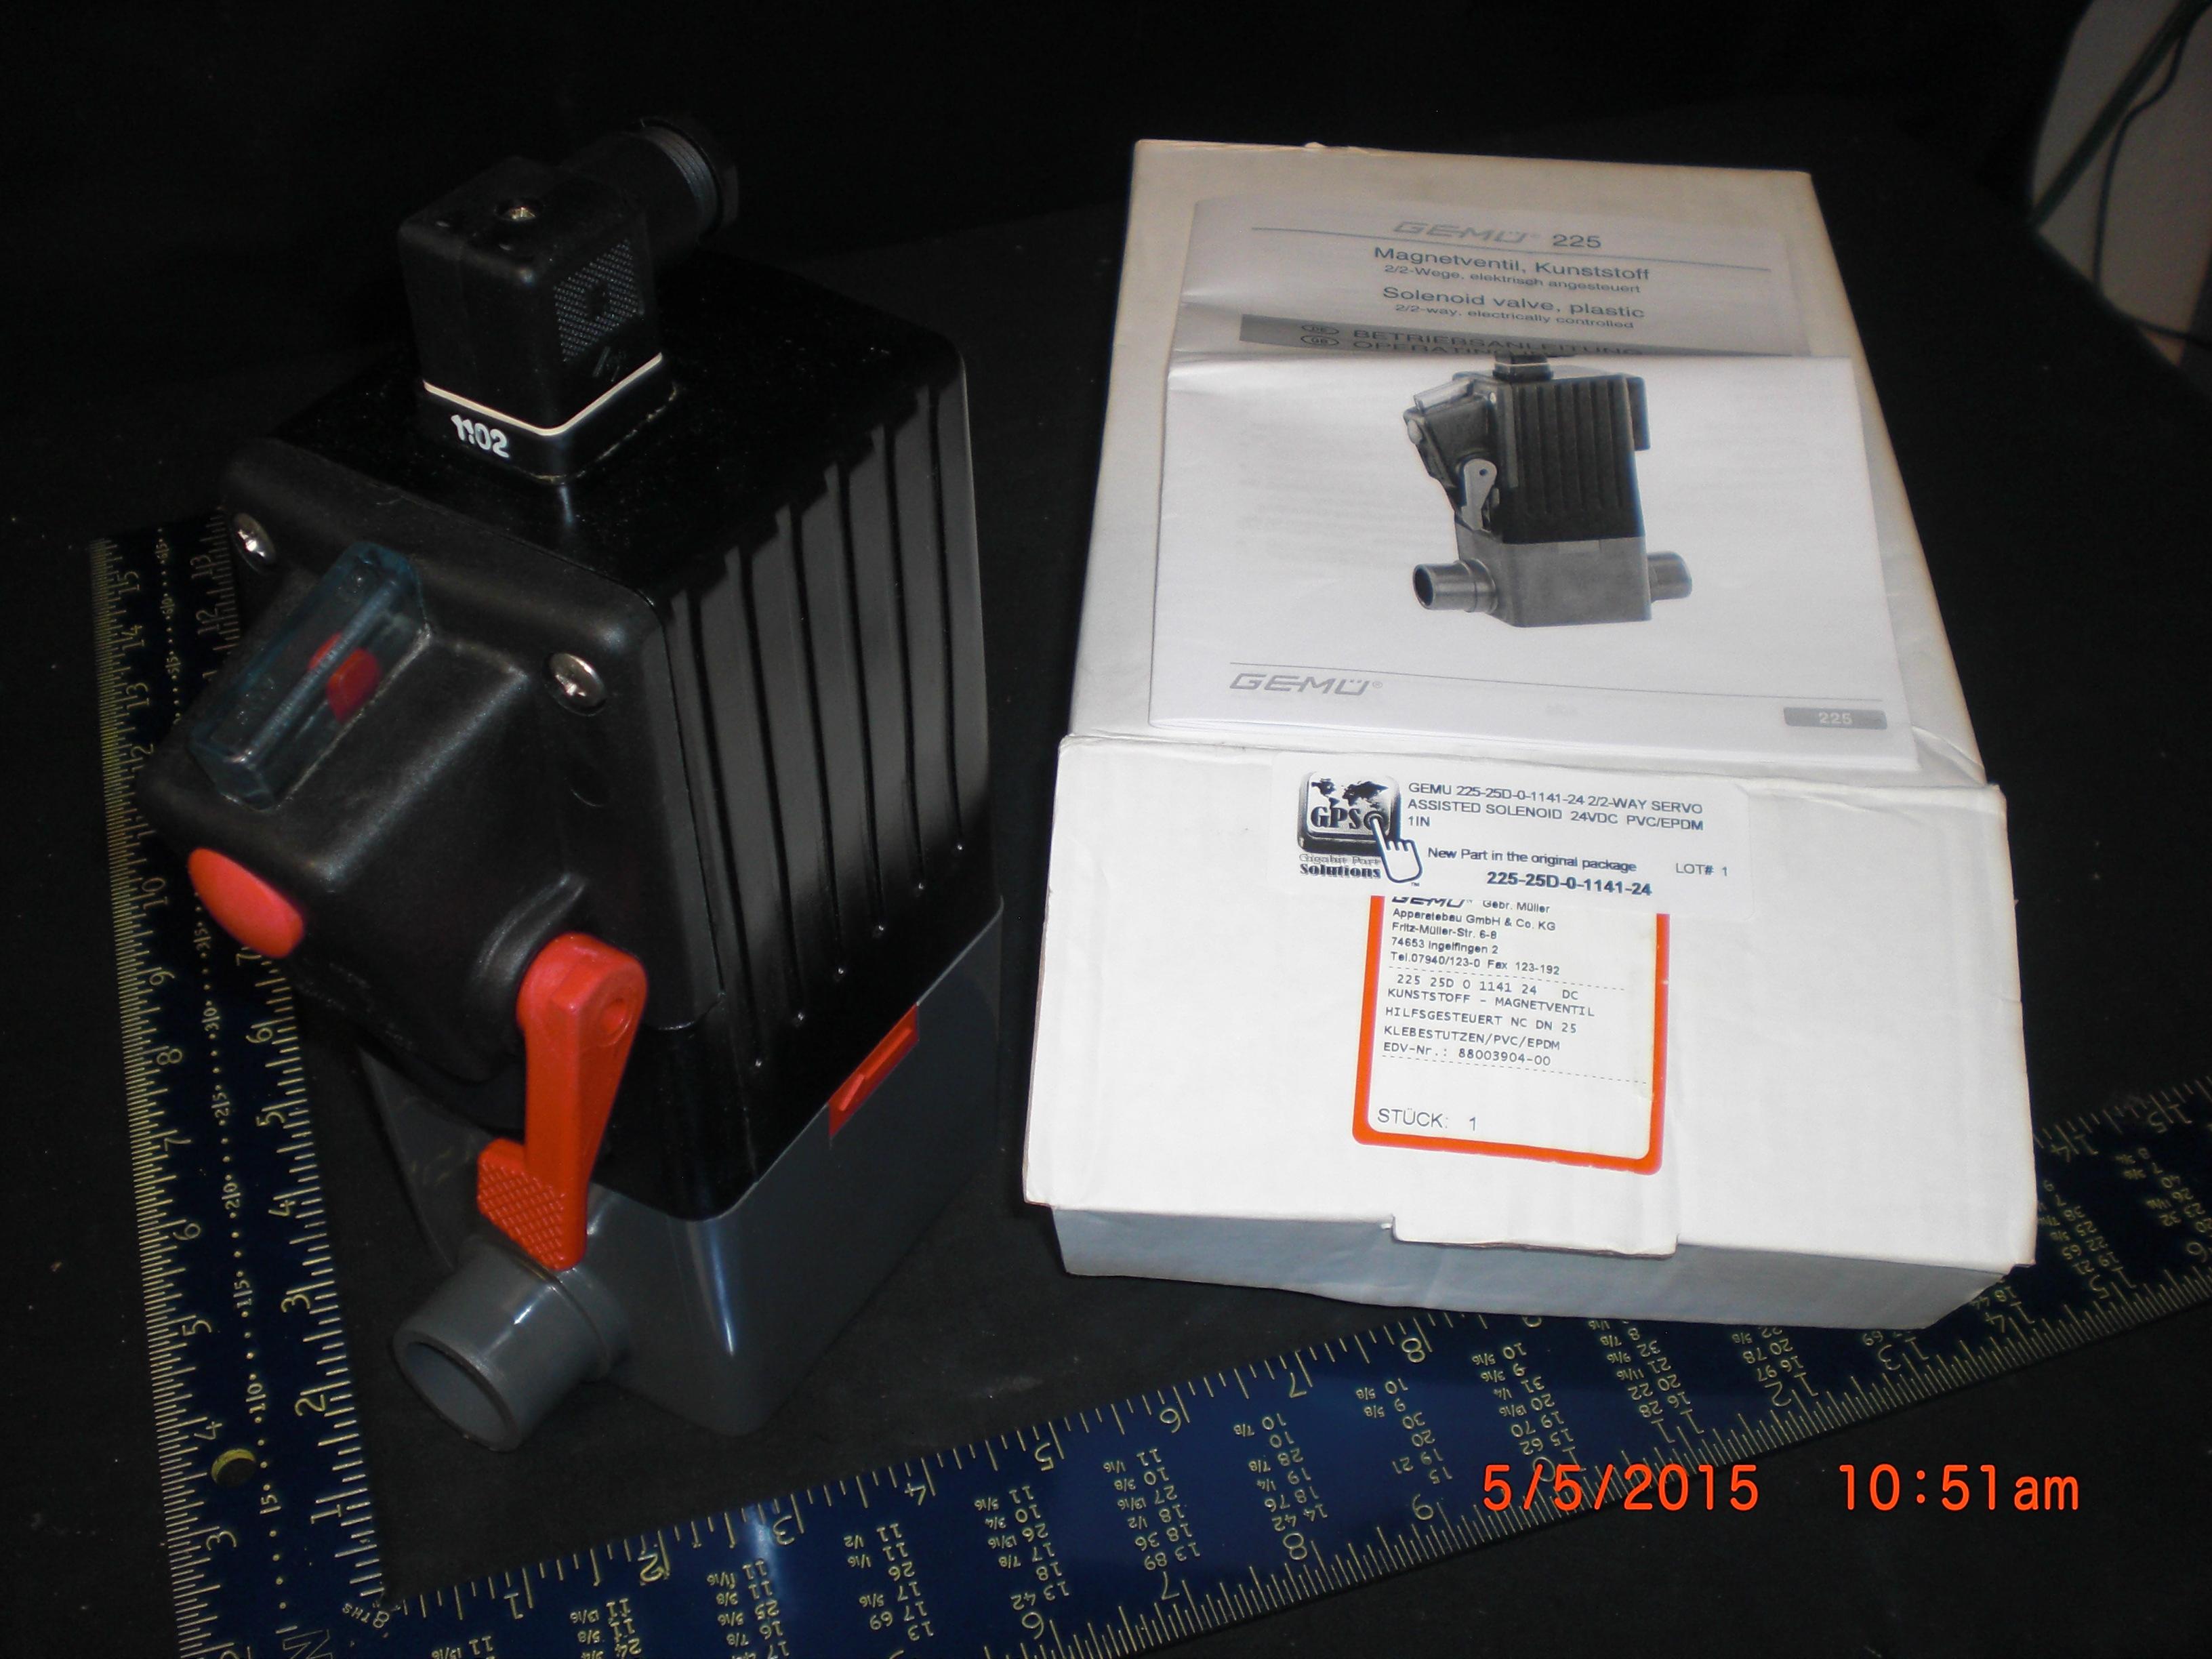 Valve Servo Solenoid 24VDC  PVC/EPDM  1in  2/2-way GEMU 225-25D-0-1141-24